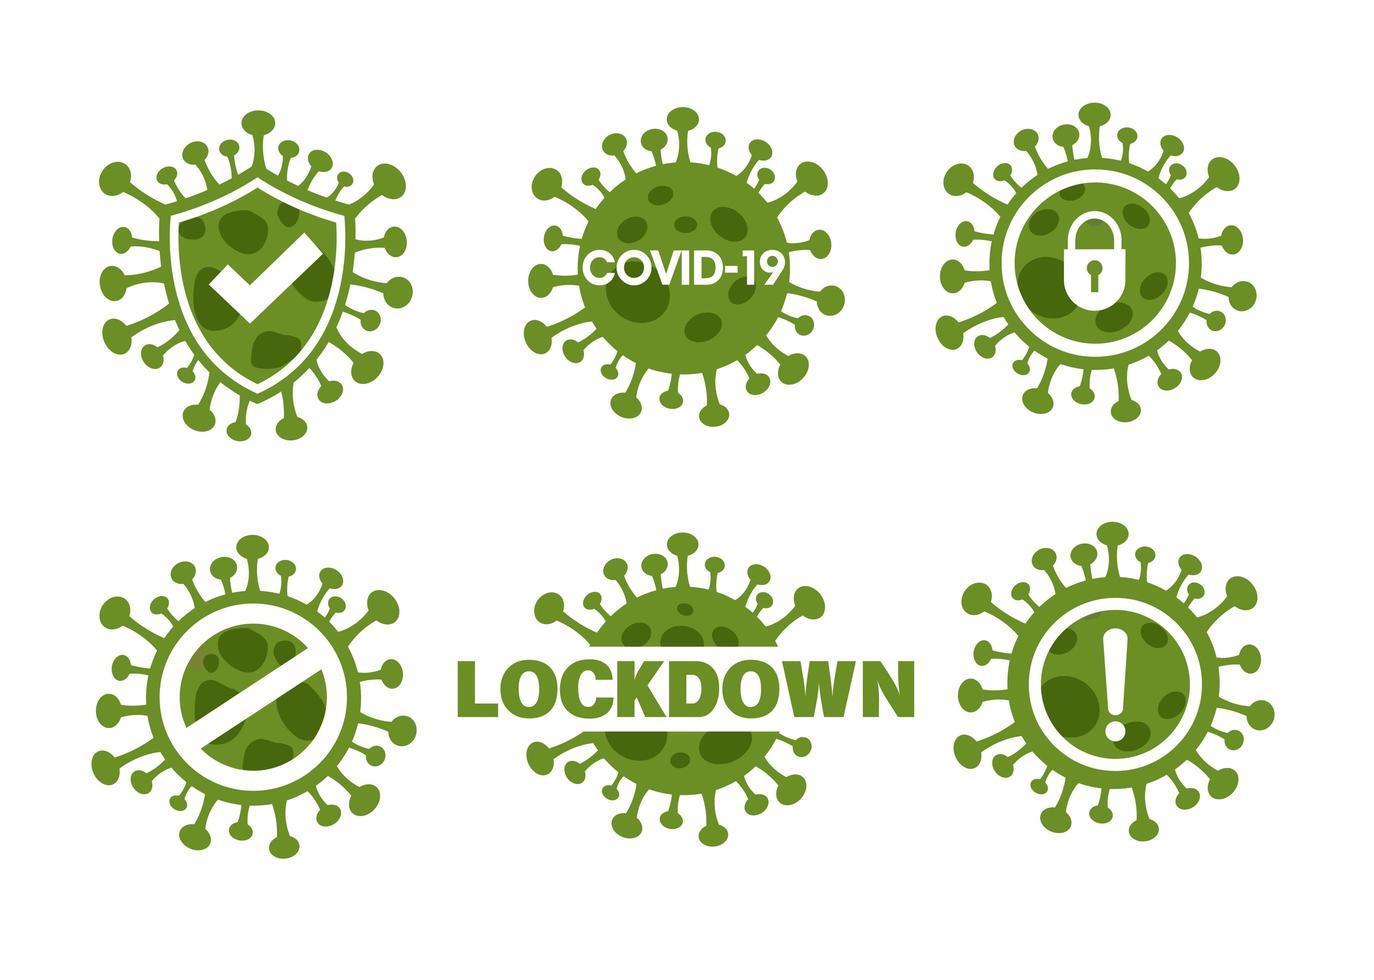 neuartiges Corona-Virus oder Covid-19-Icon-Set vektor